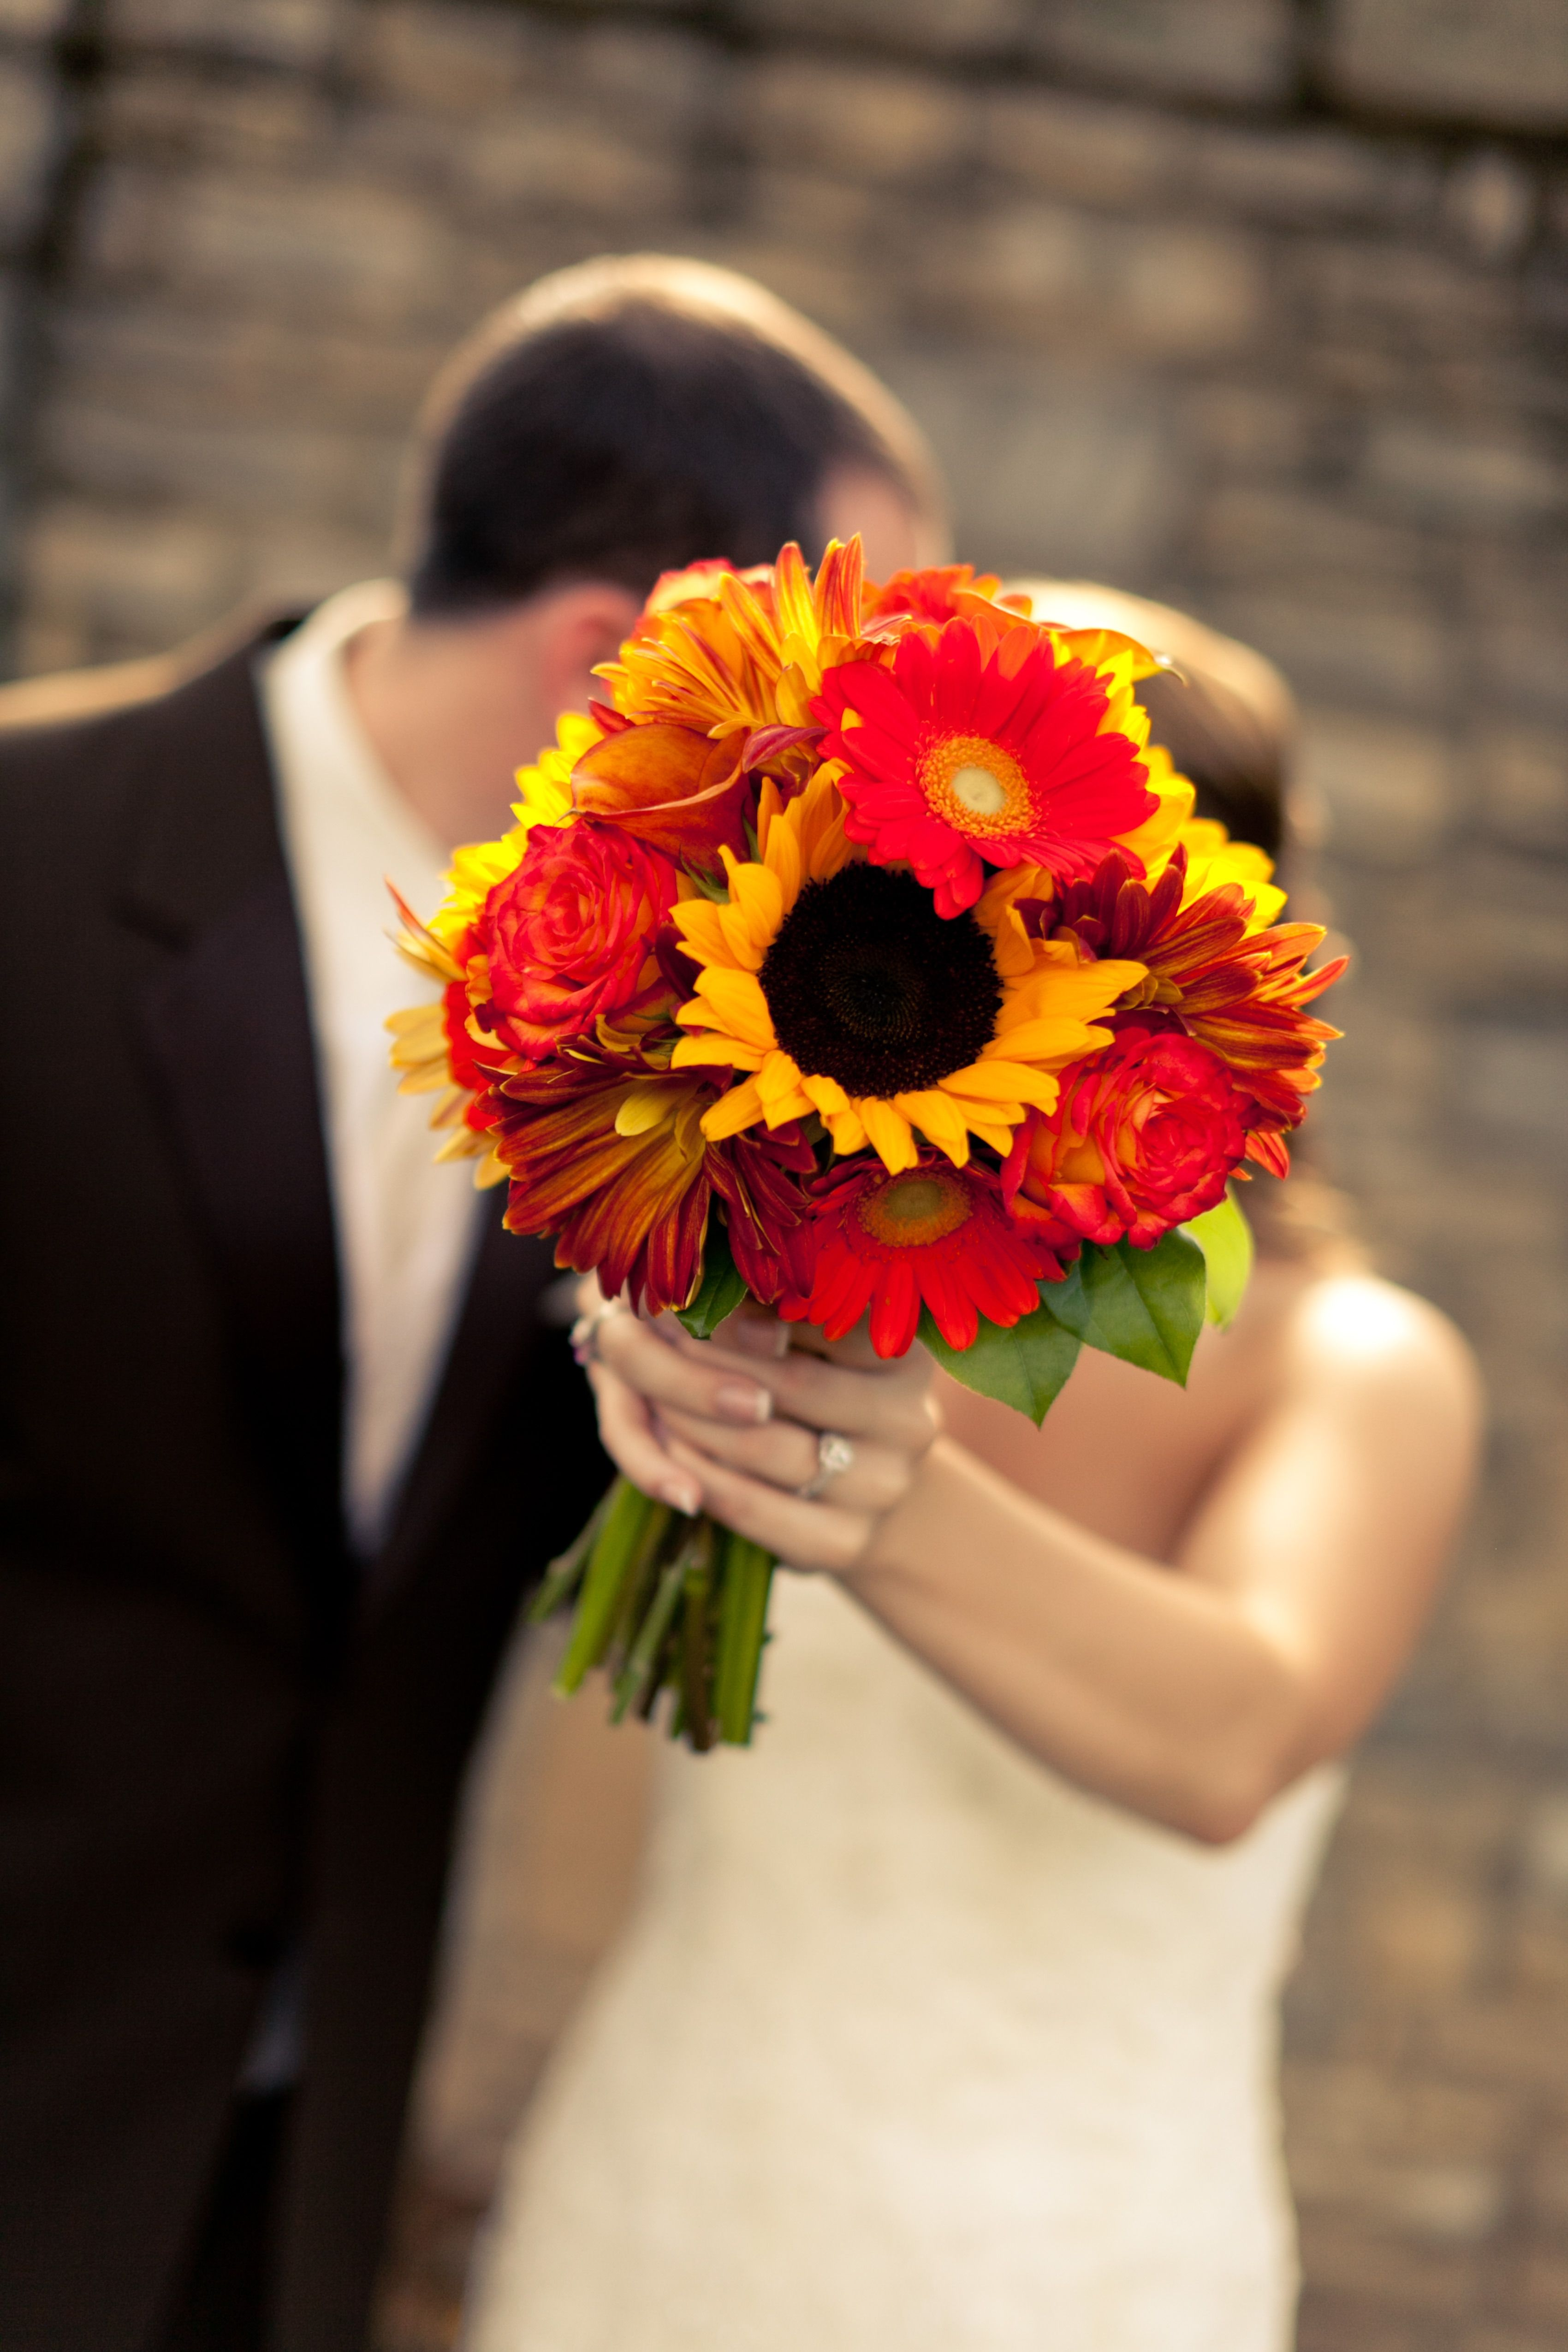 Fall wedding bouquets with sunflowers fall sunflower garden fall fall wedding bouquets with sunflowers fall sunflower garden fall garden red yellow orange flowers izmirmasajfo